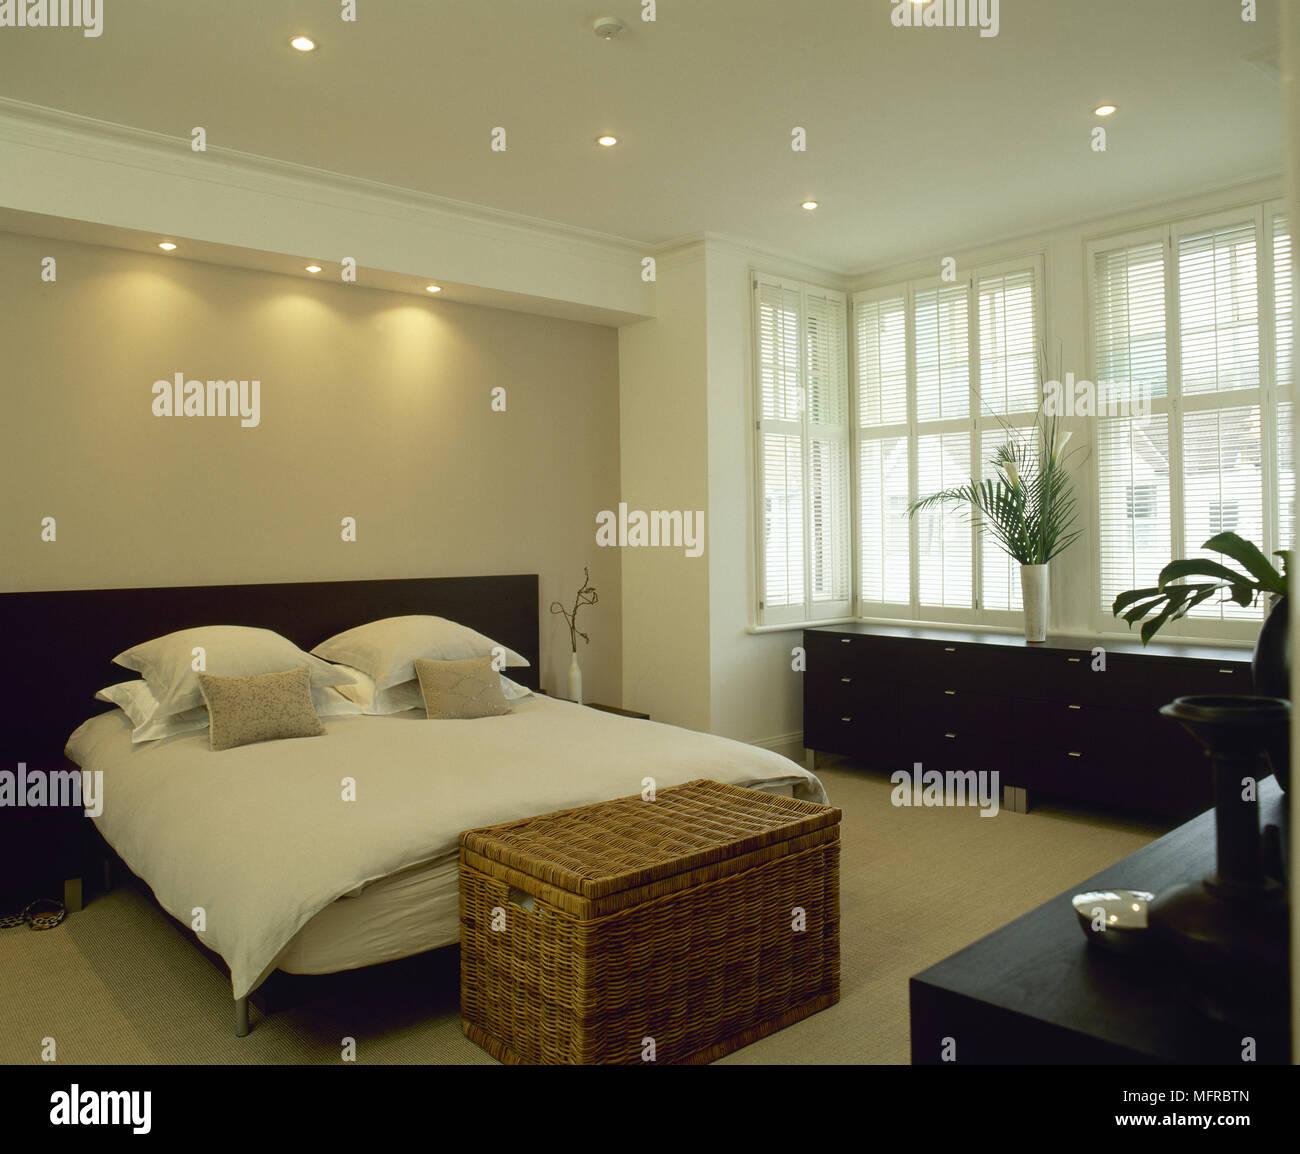 Iluminacion dormitorio moderno trendy cmo iluminar un - Iluminacion dormitorio moderno ...